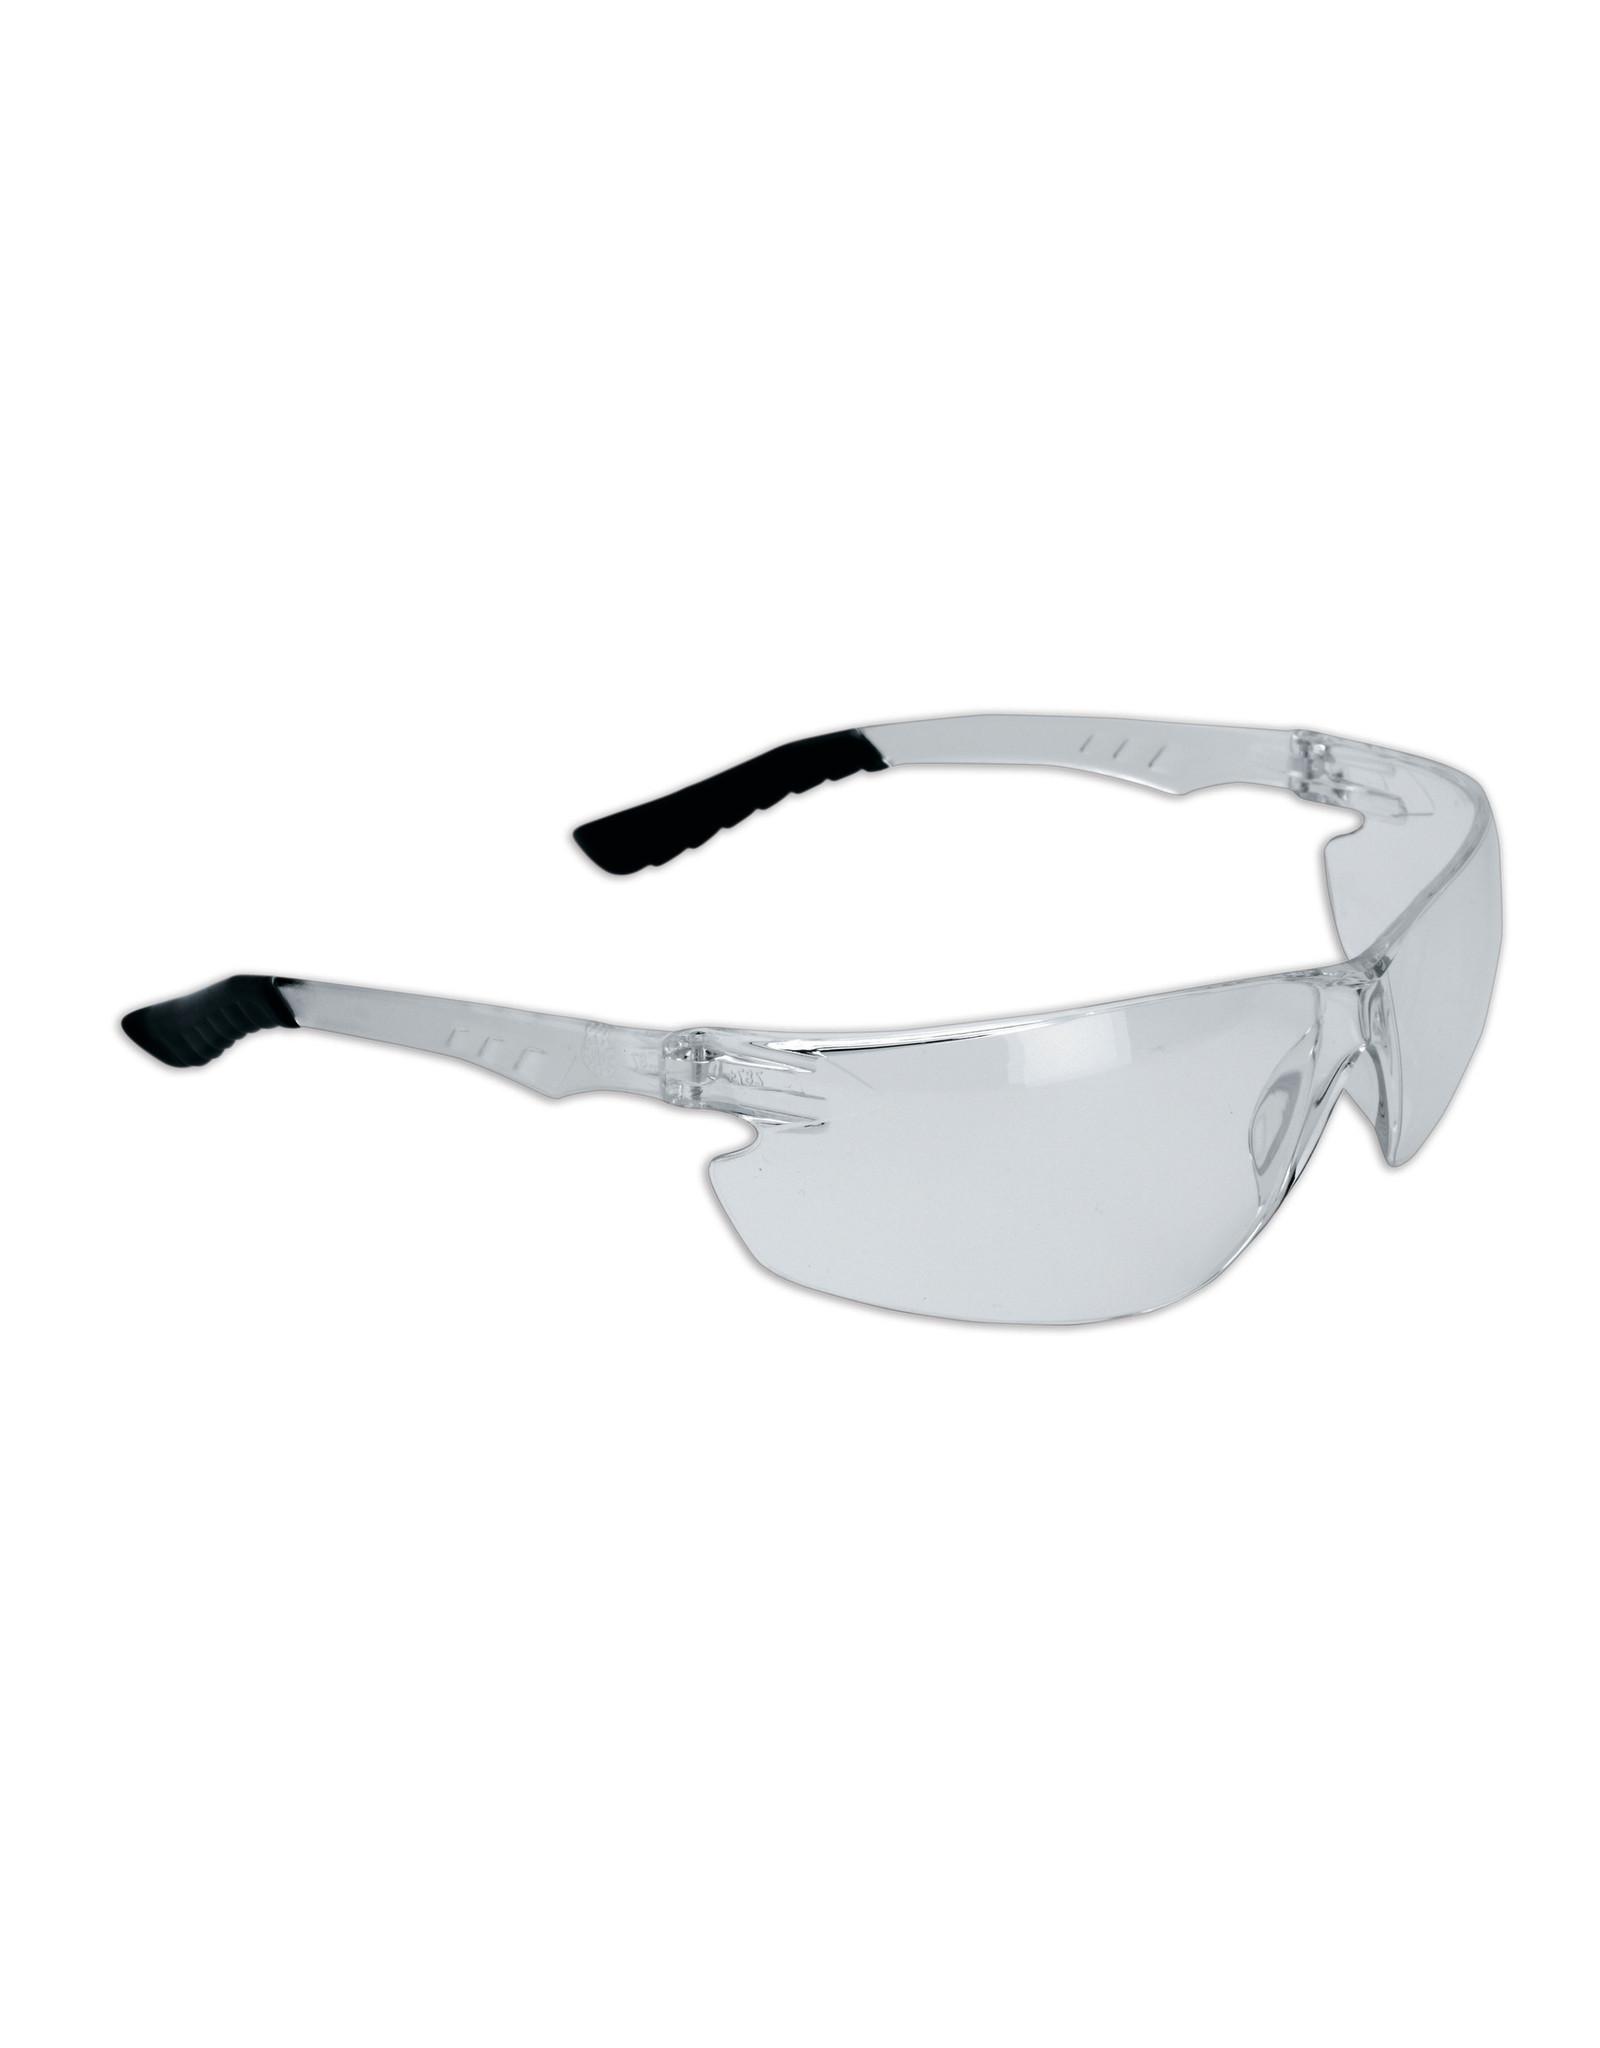 FIREBIRD Safety Glasses